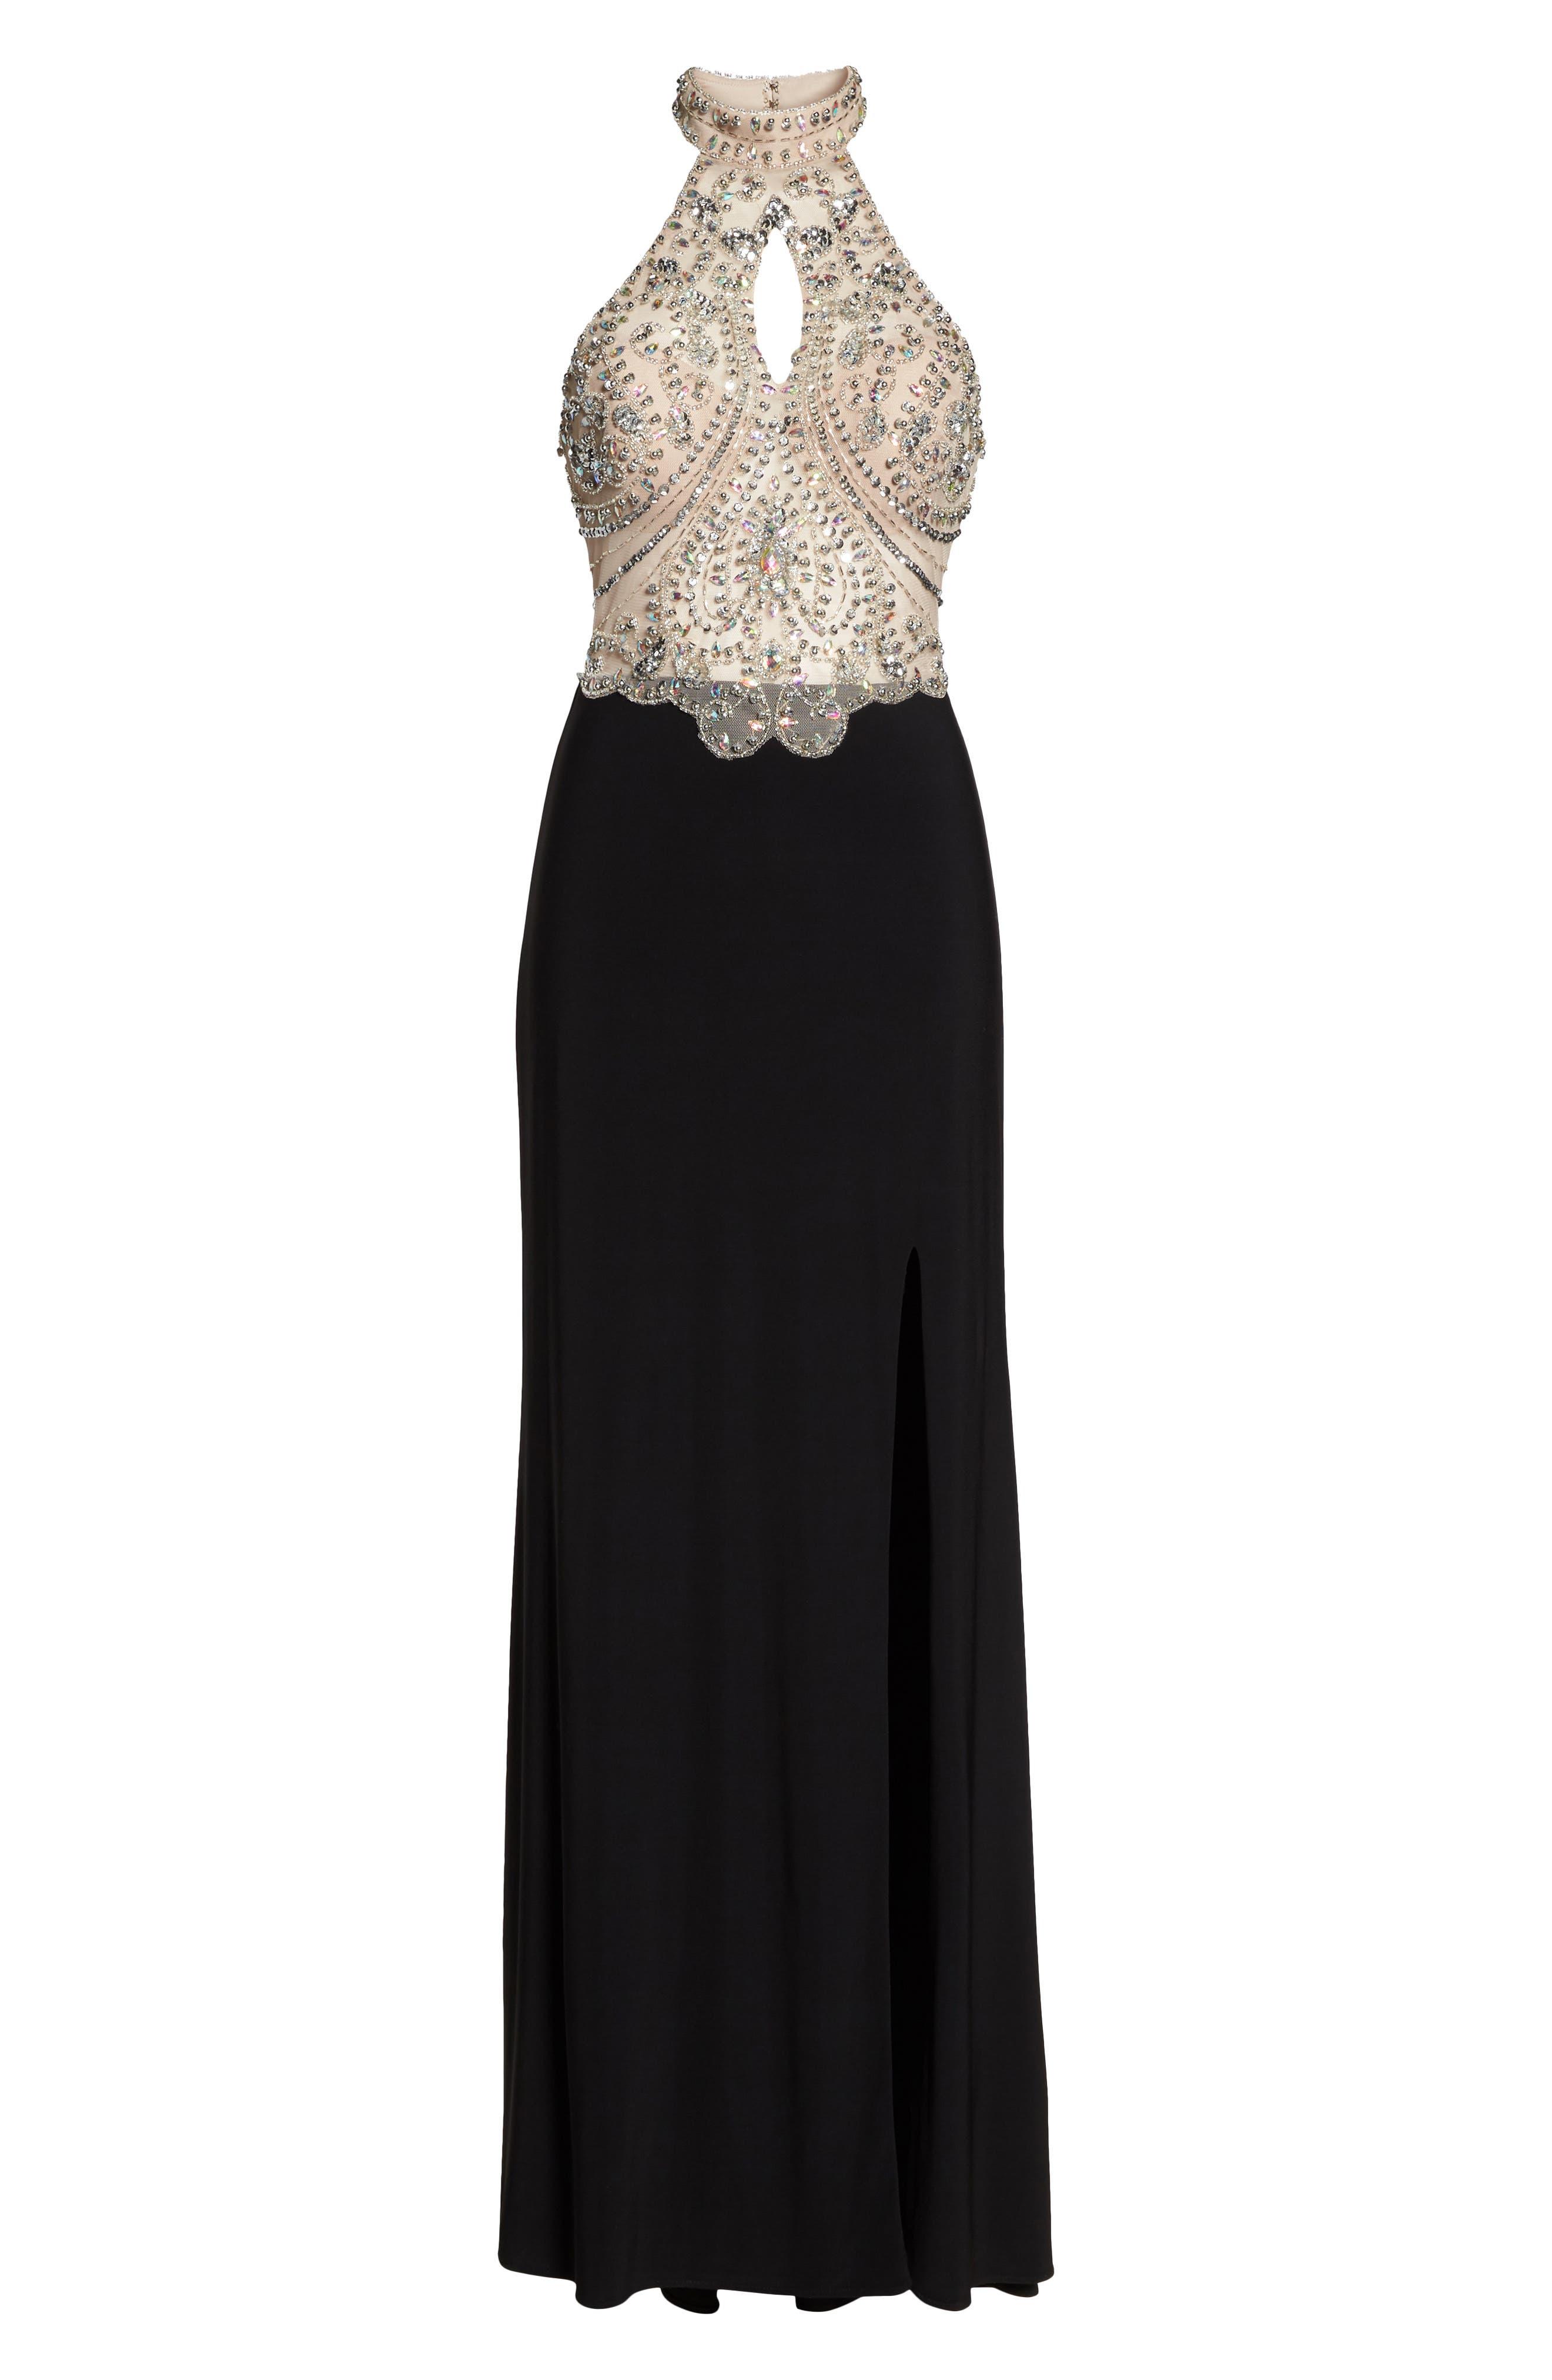 Embellished Bodice Halter Knit Gown,                             Alternate thumbnail 6, color,                             Nude/ Black